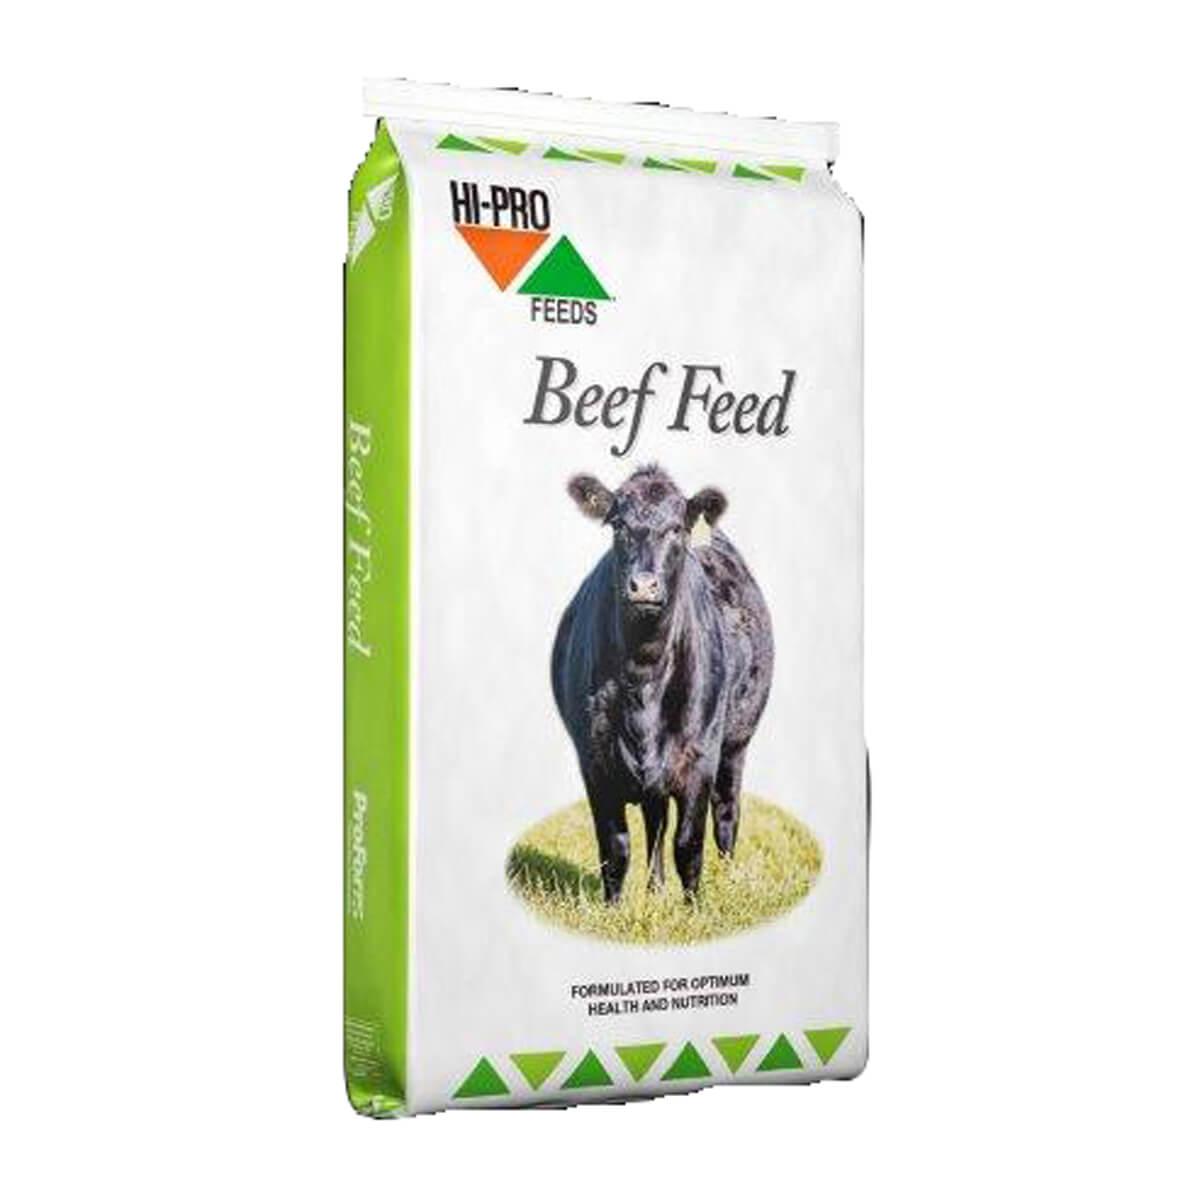 HiPro 30% Medicated Beef Supplement - 20 kg